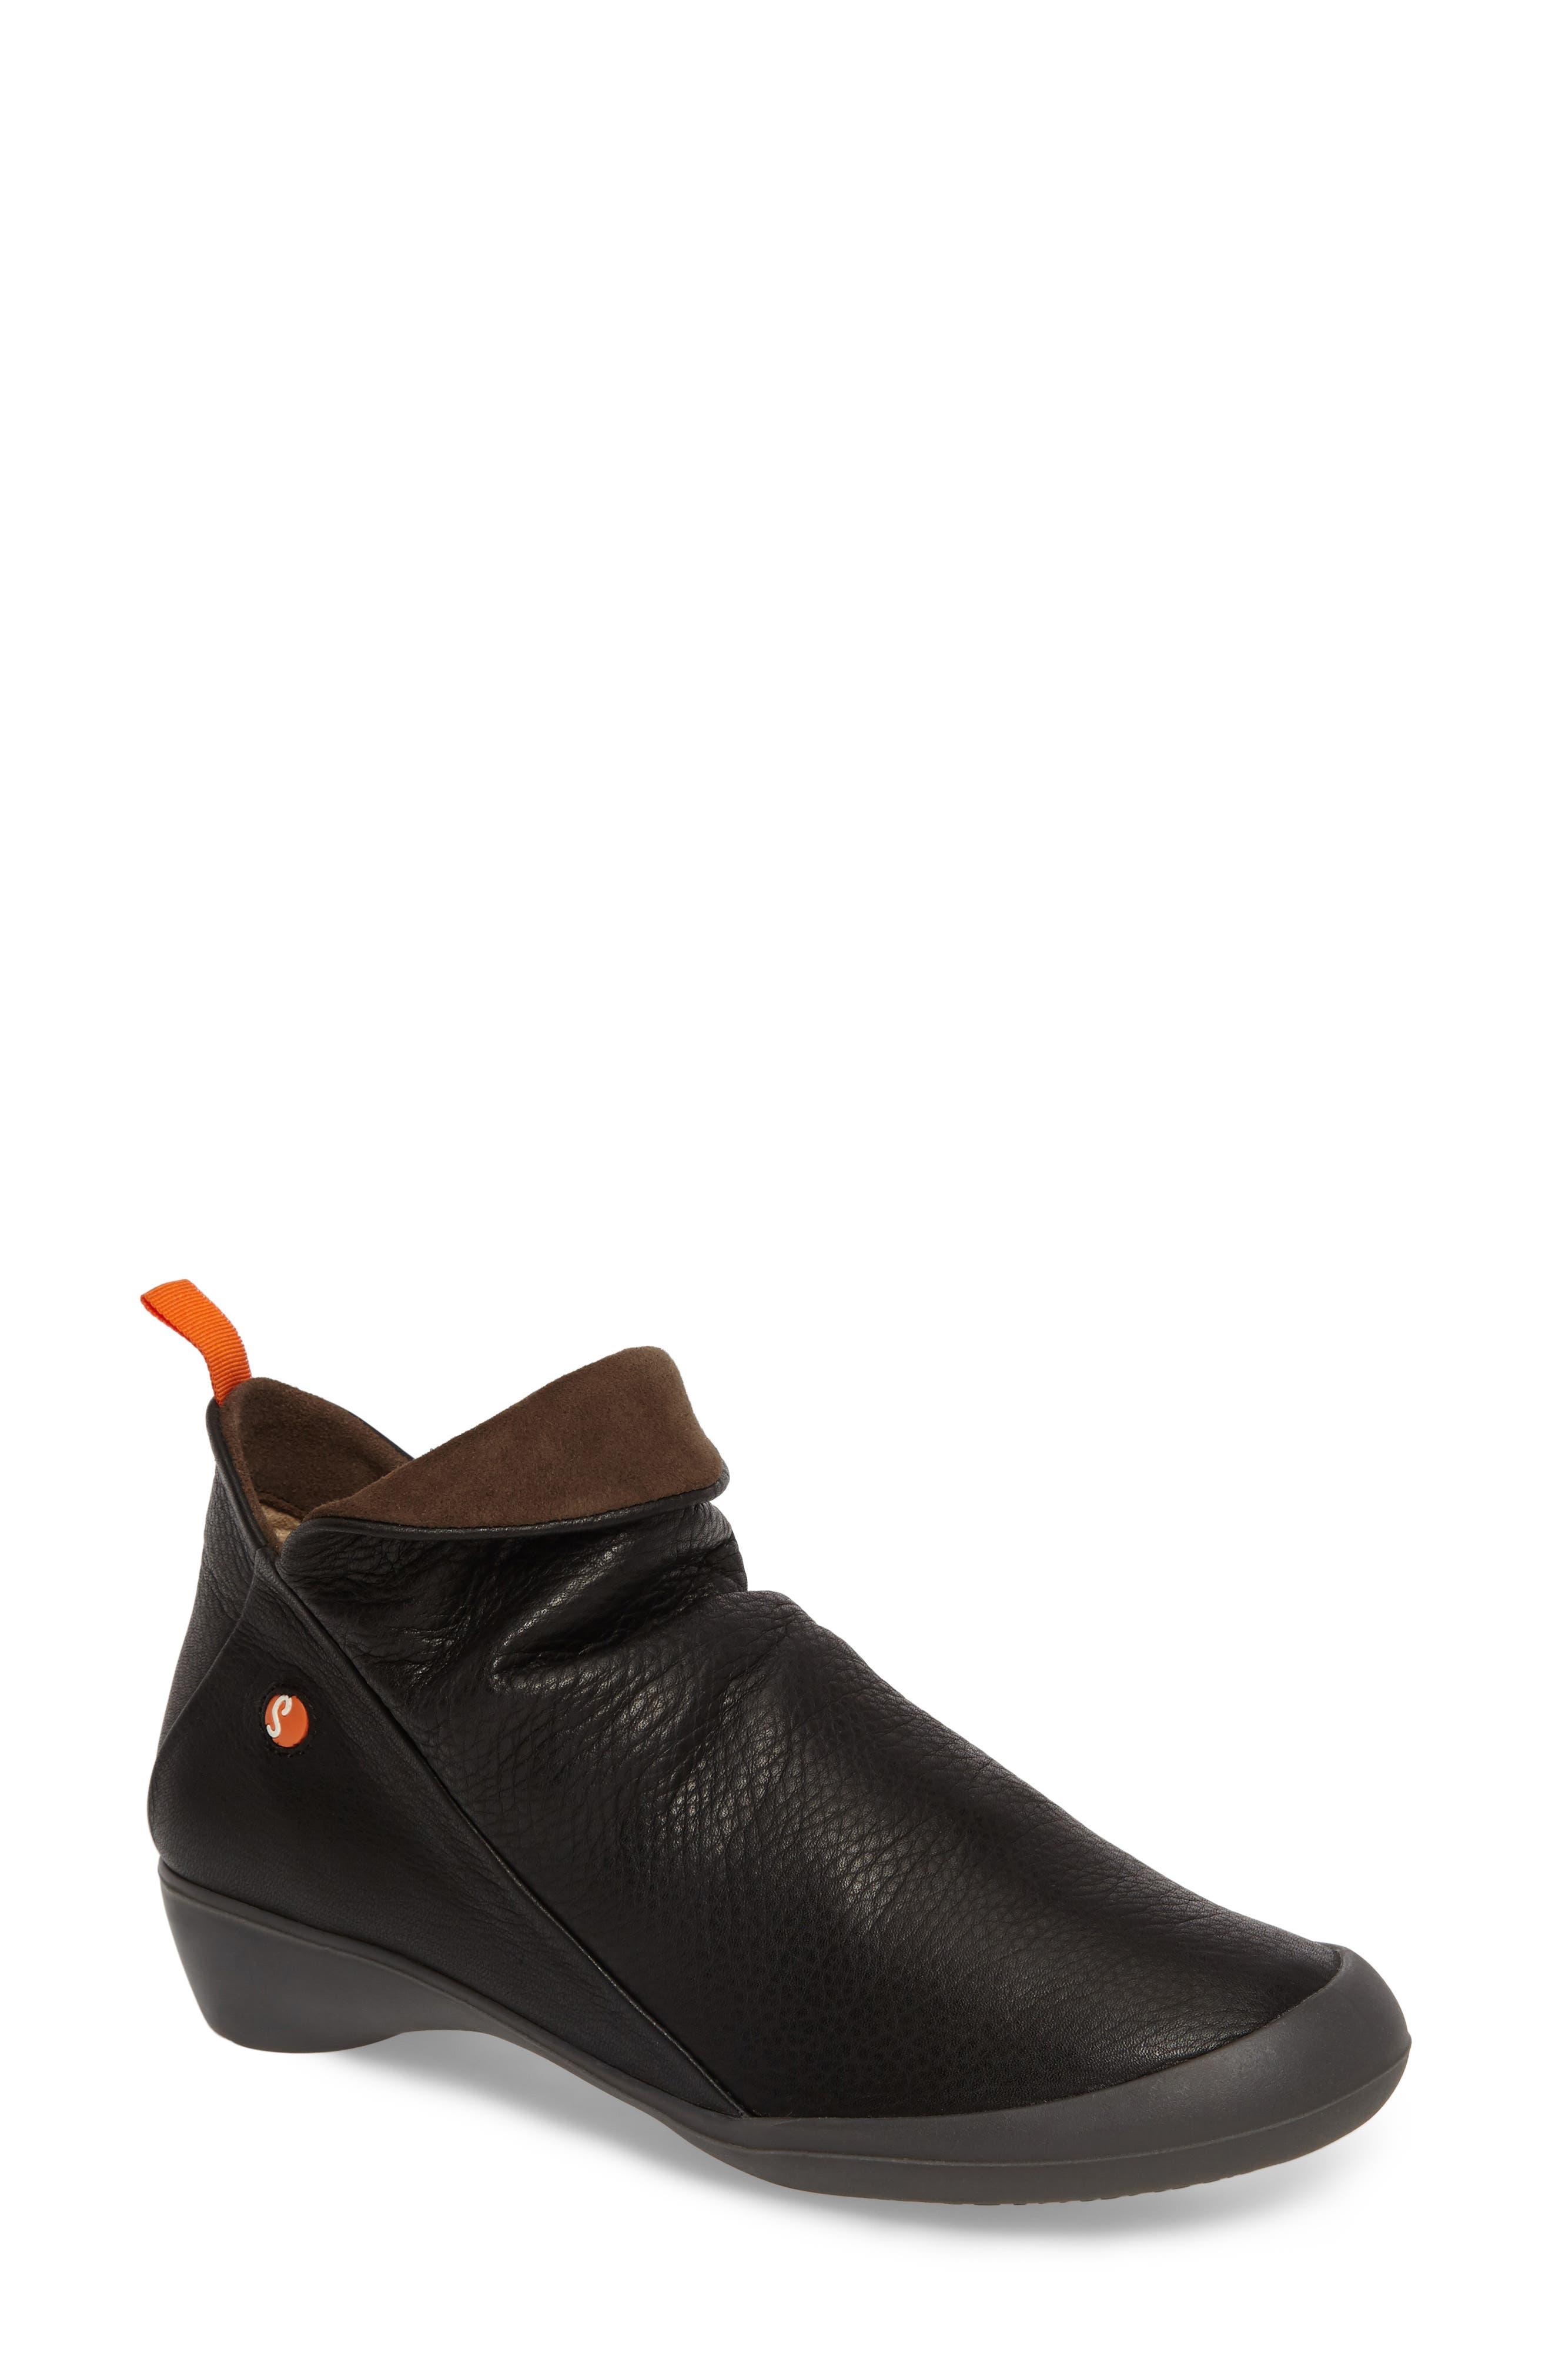 Farah Bootie,                         Main,                         color, Black/ Brown Leather